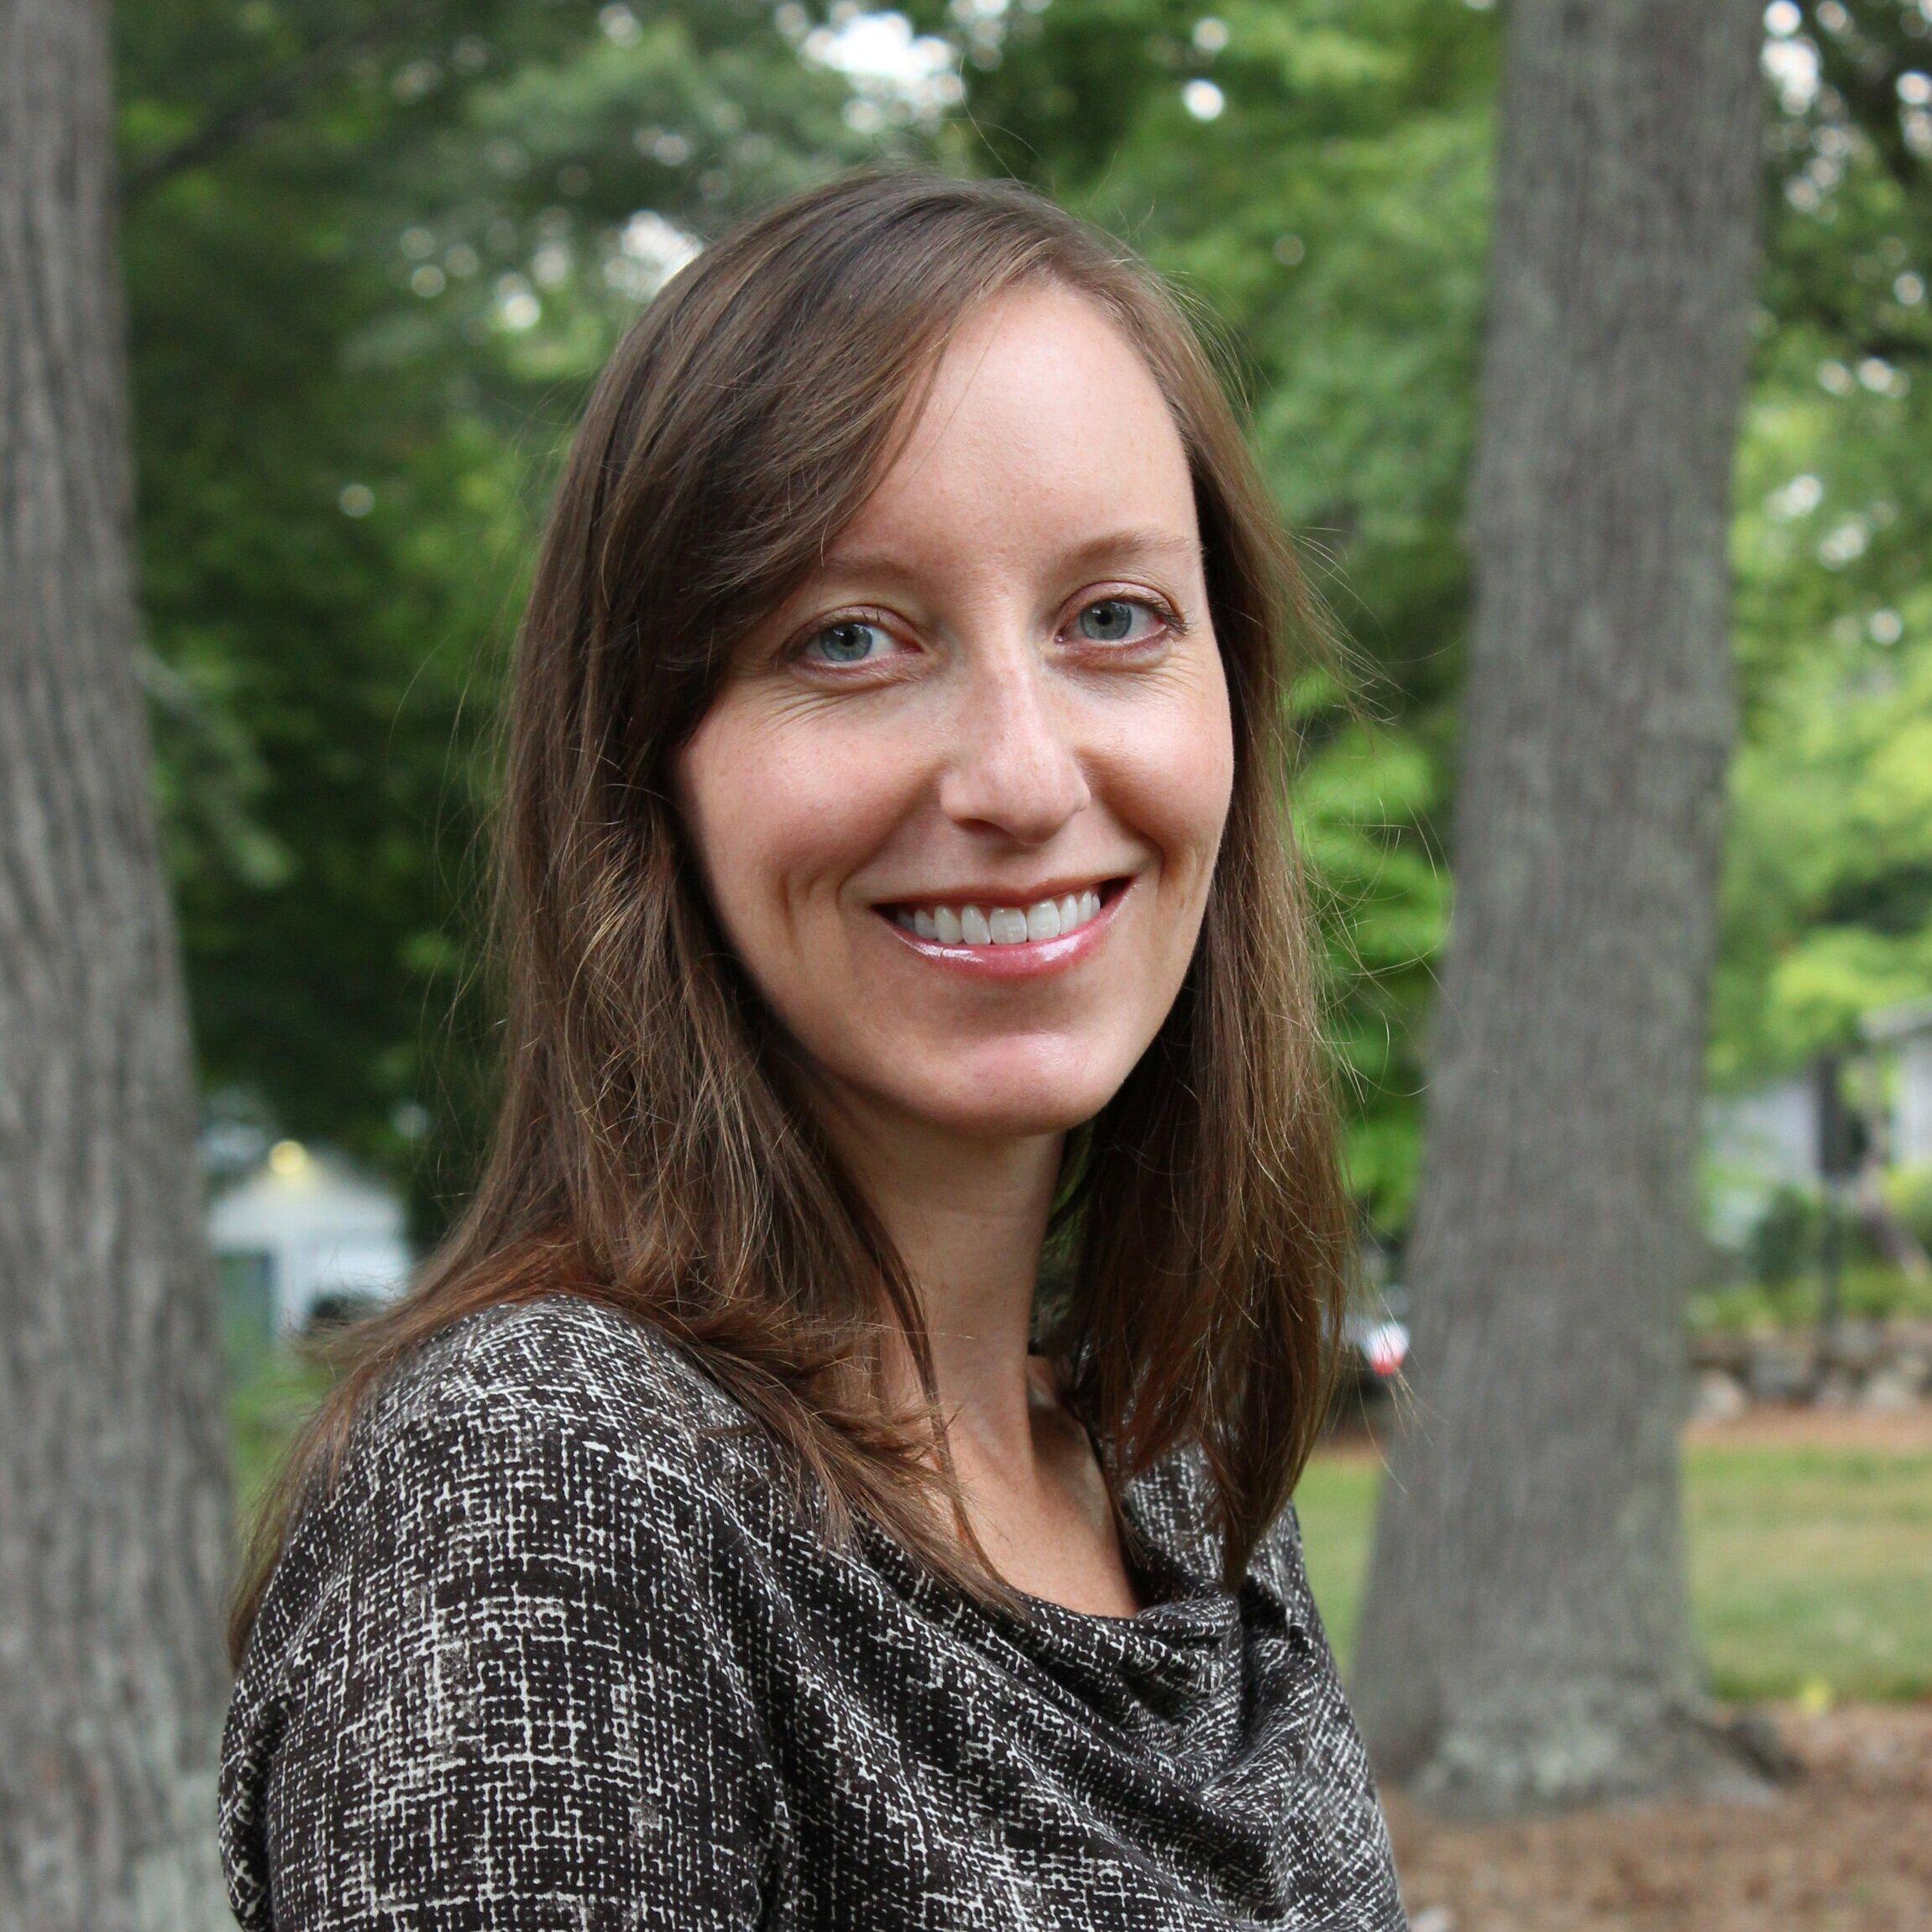 Jessica Wilkerson